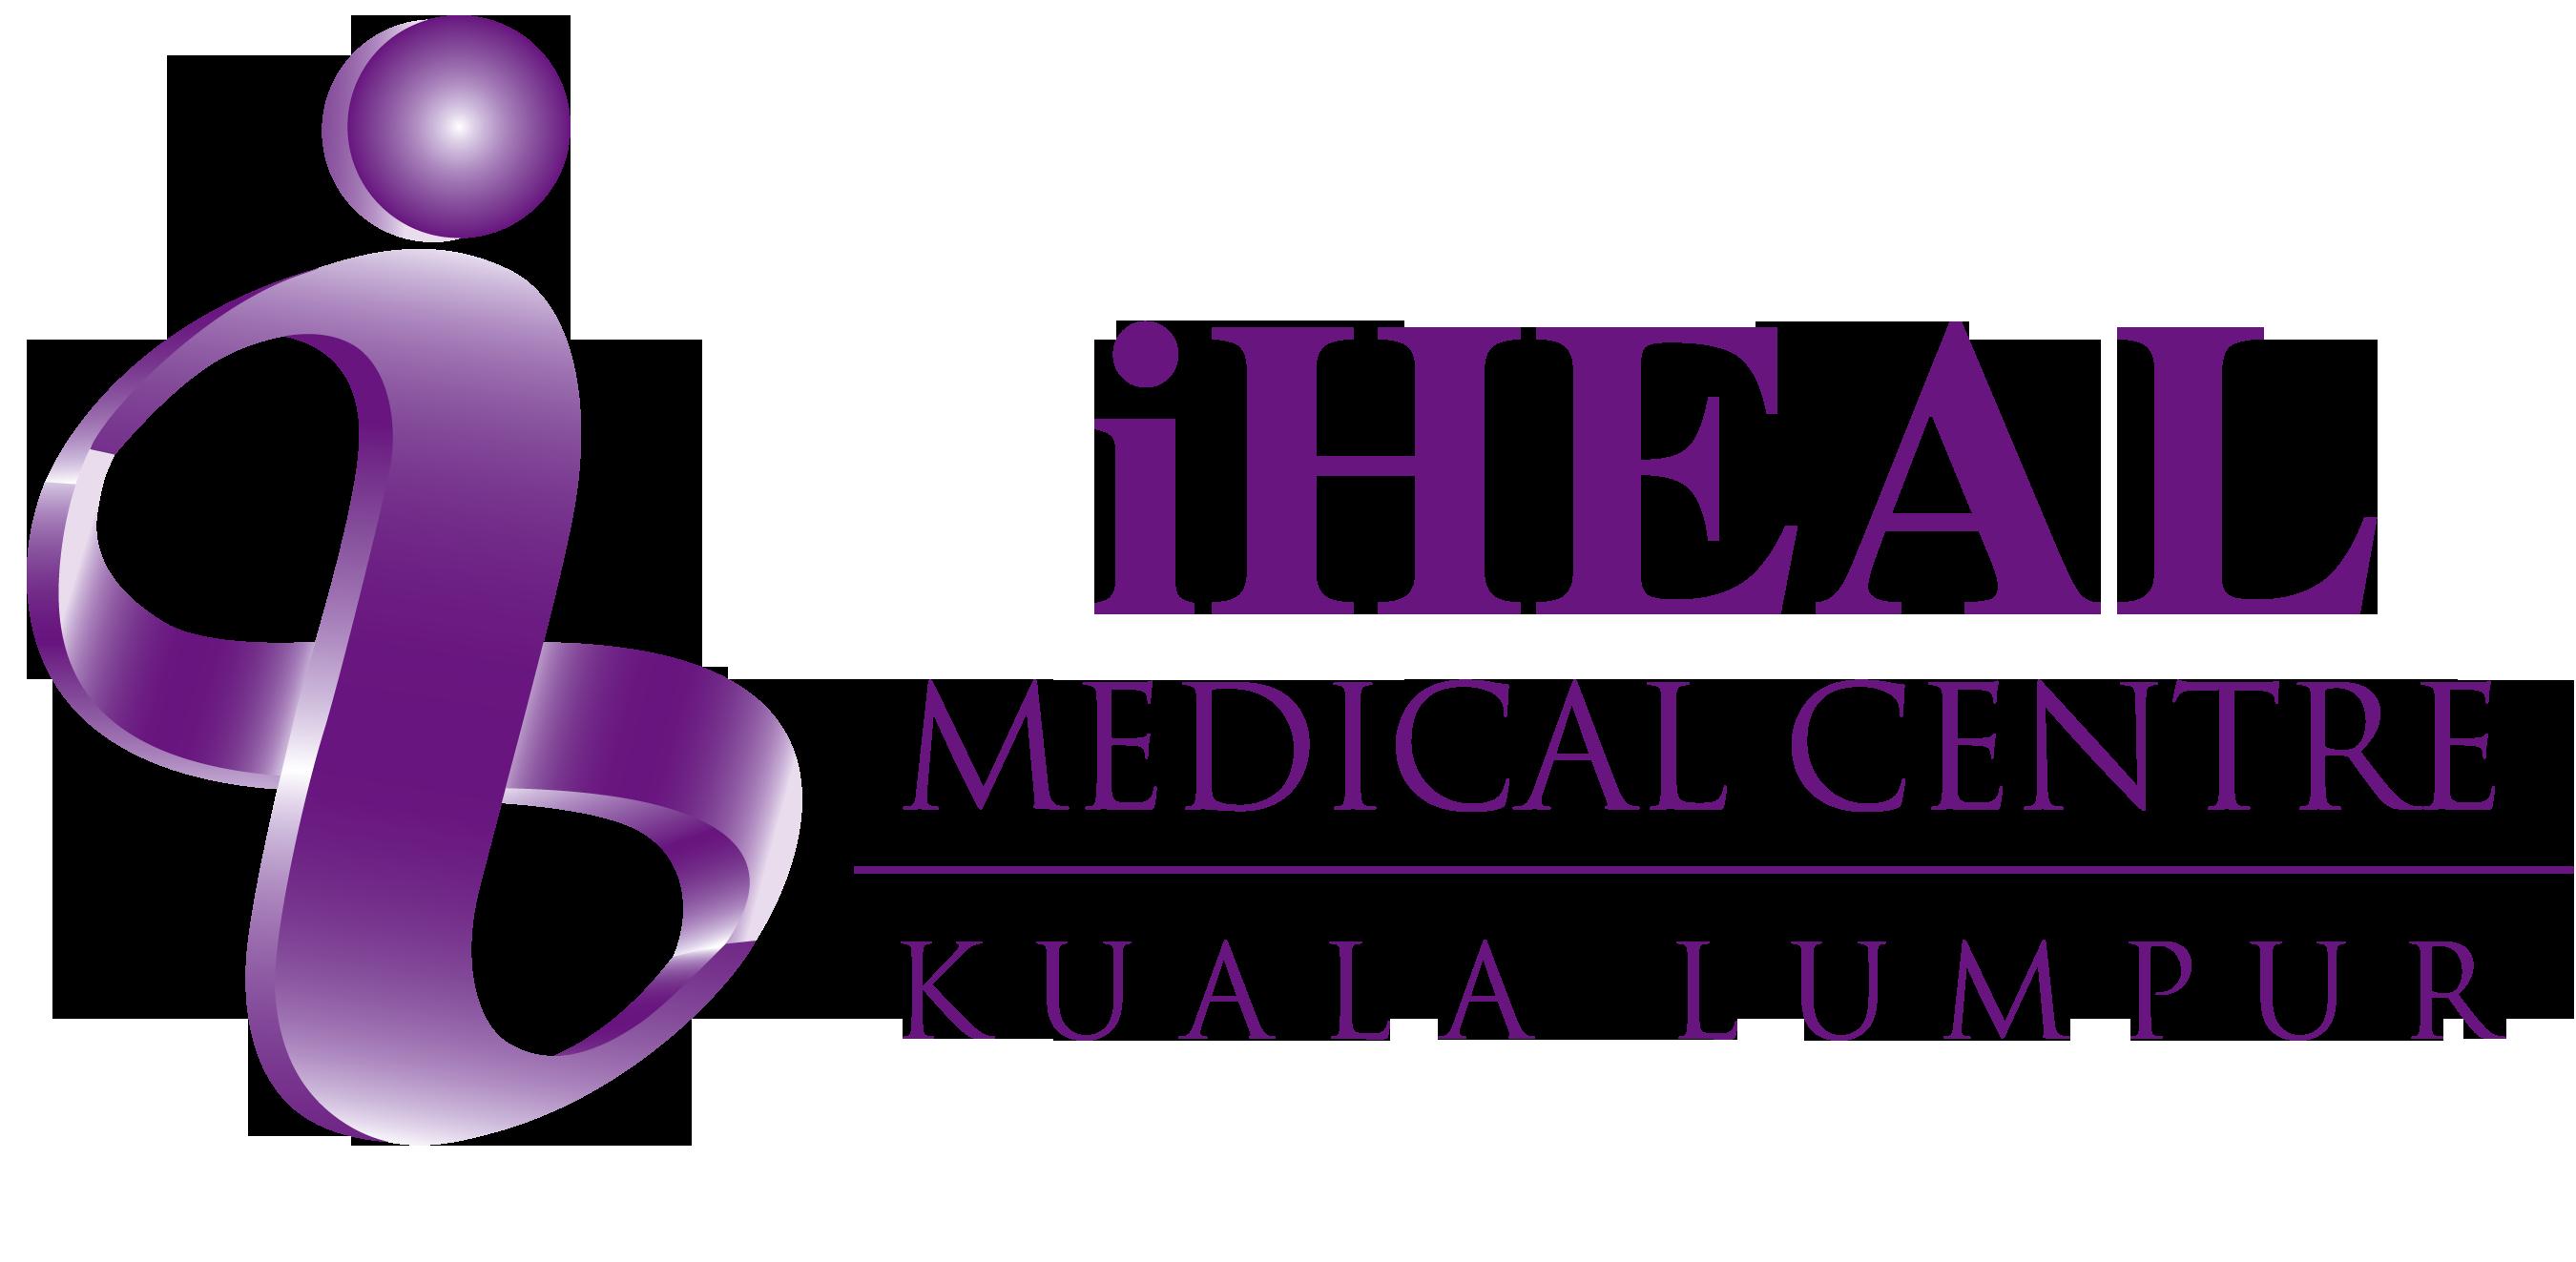 iHEAL Medical Centre Kuala Lumpur